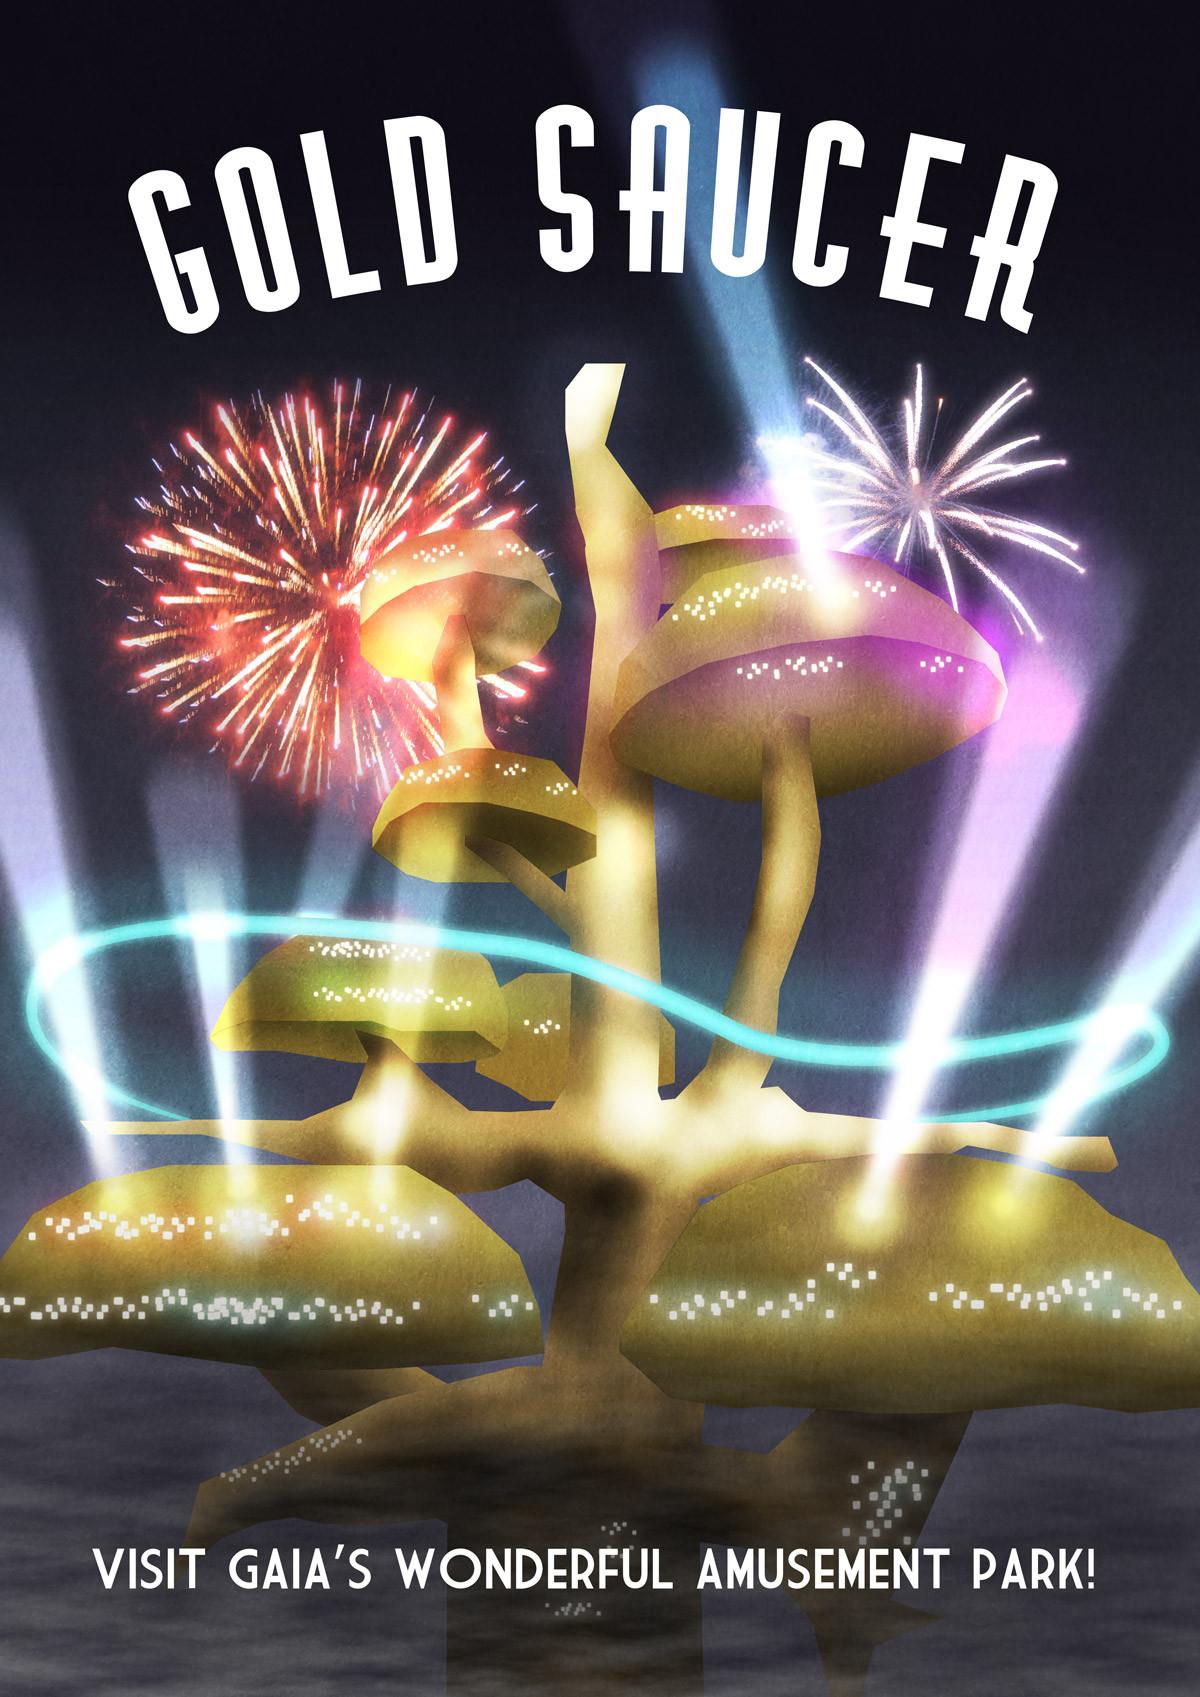 gold-saucer-final-fantasy-vii-travel-posters_1